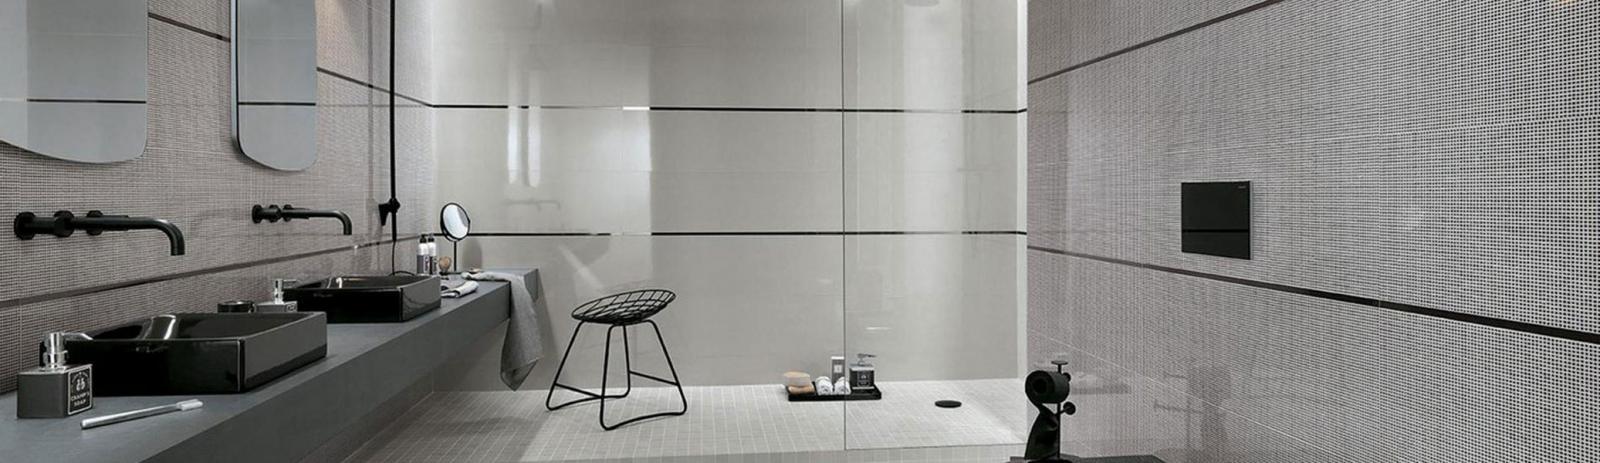 banner-pat-contemporary-italian-wall-tile-ceramiche-fap-anaheim-1900x550